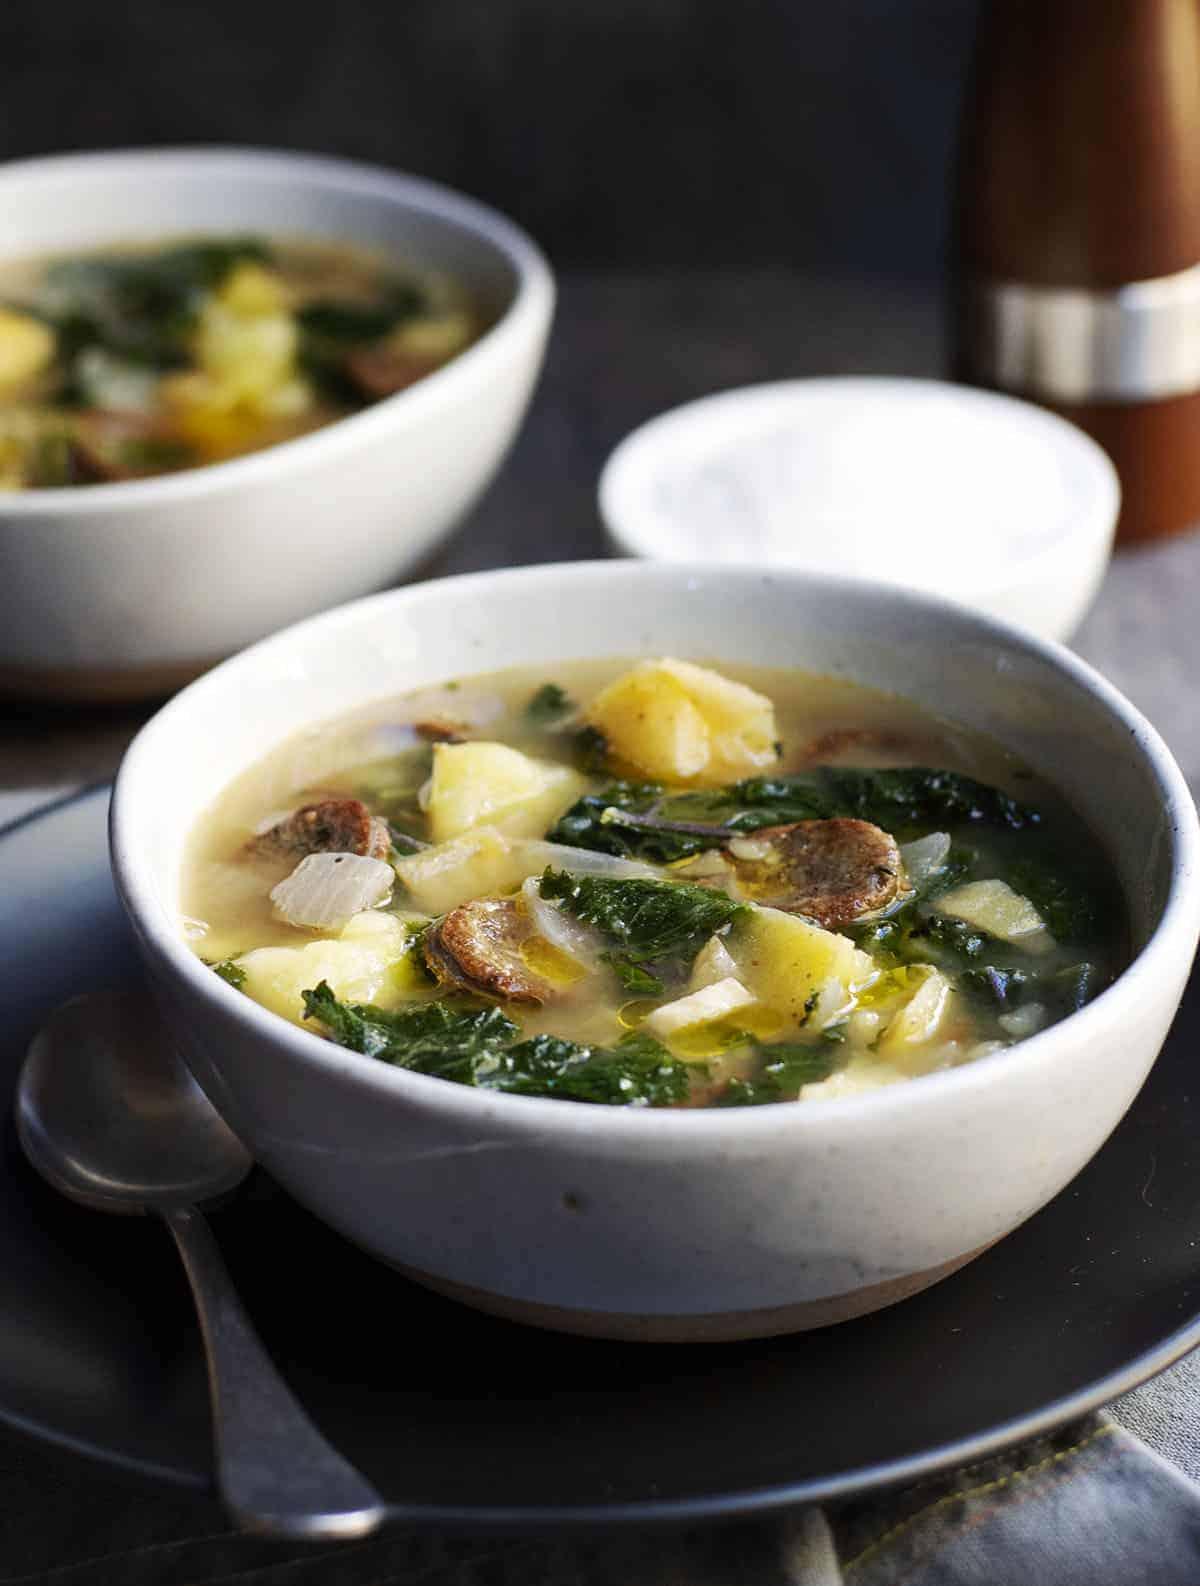 caldo verde served in ceramic bowls